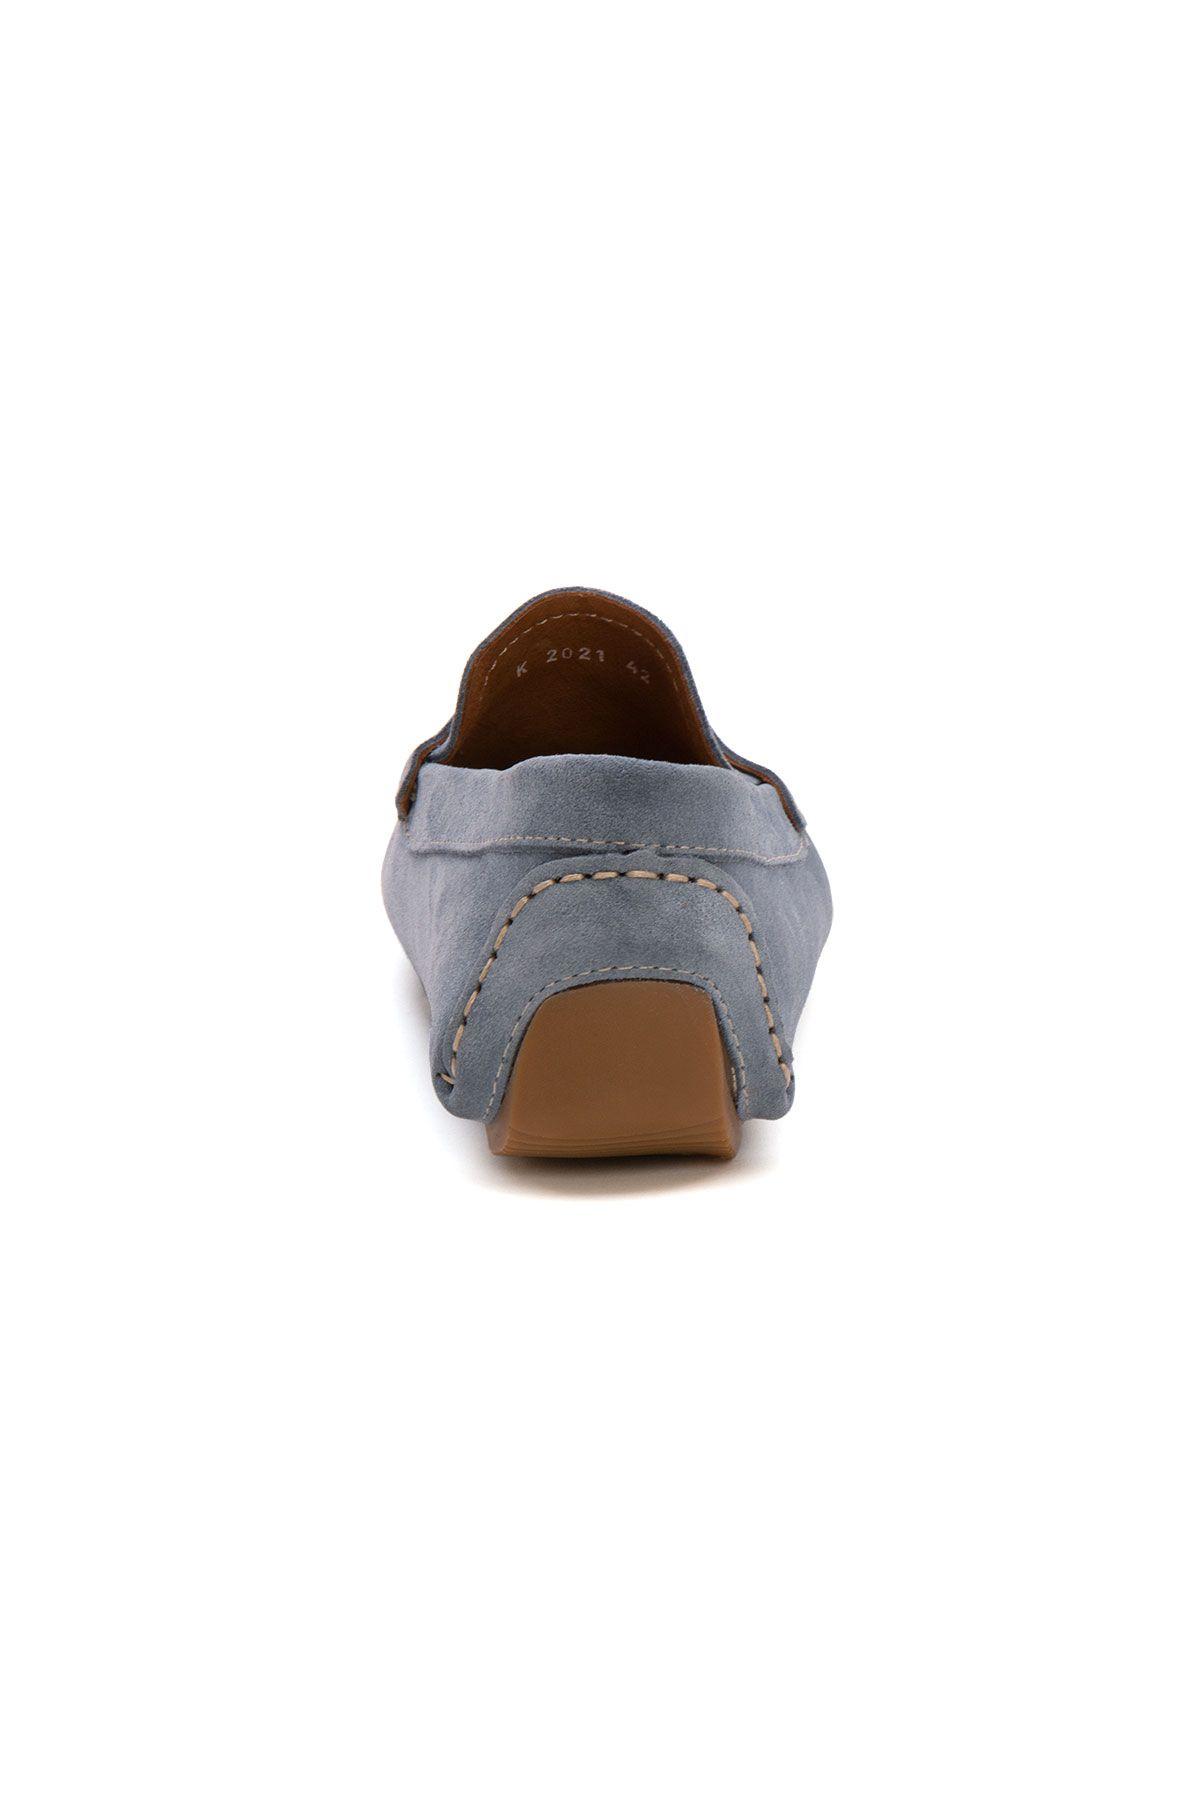 Pegia Genuine Suede Men's Loafer Shoes 500901 Blue